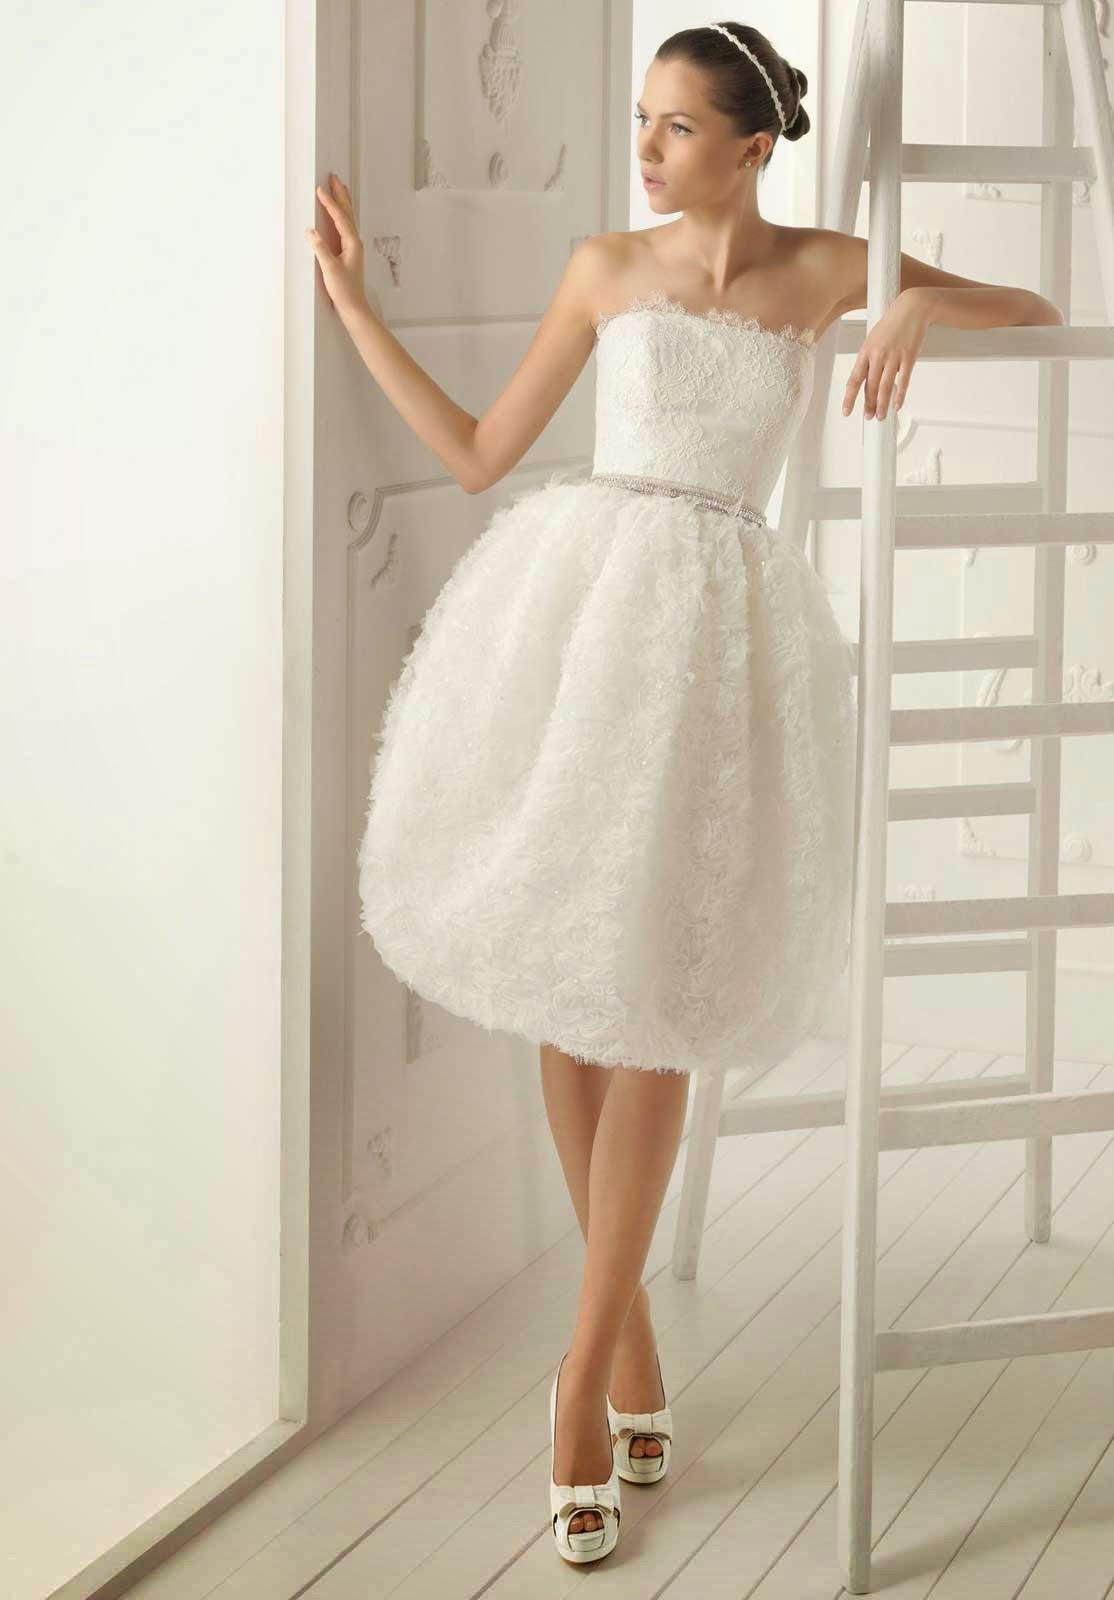 Short Casual Wedding Dresses Concept Design Photos HD